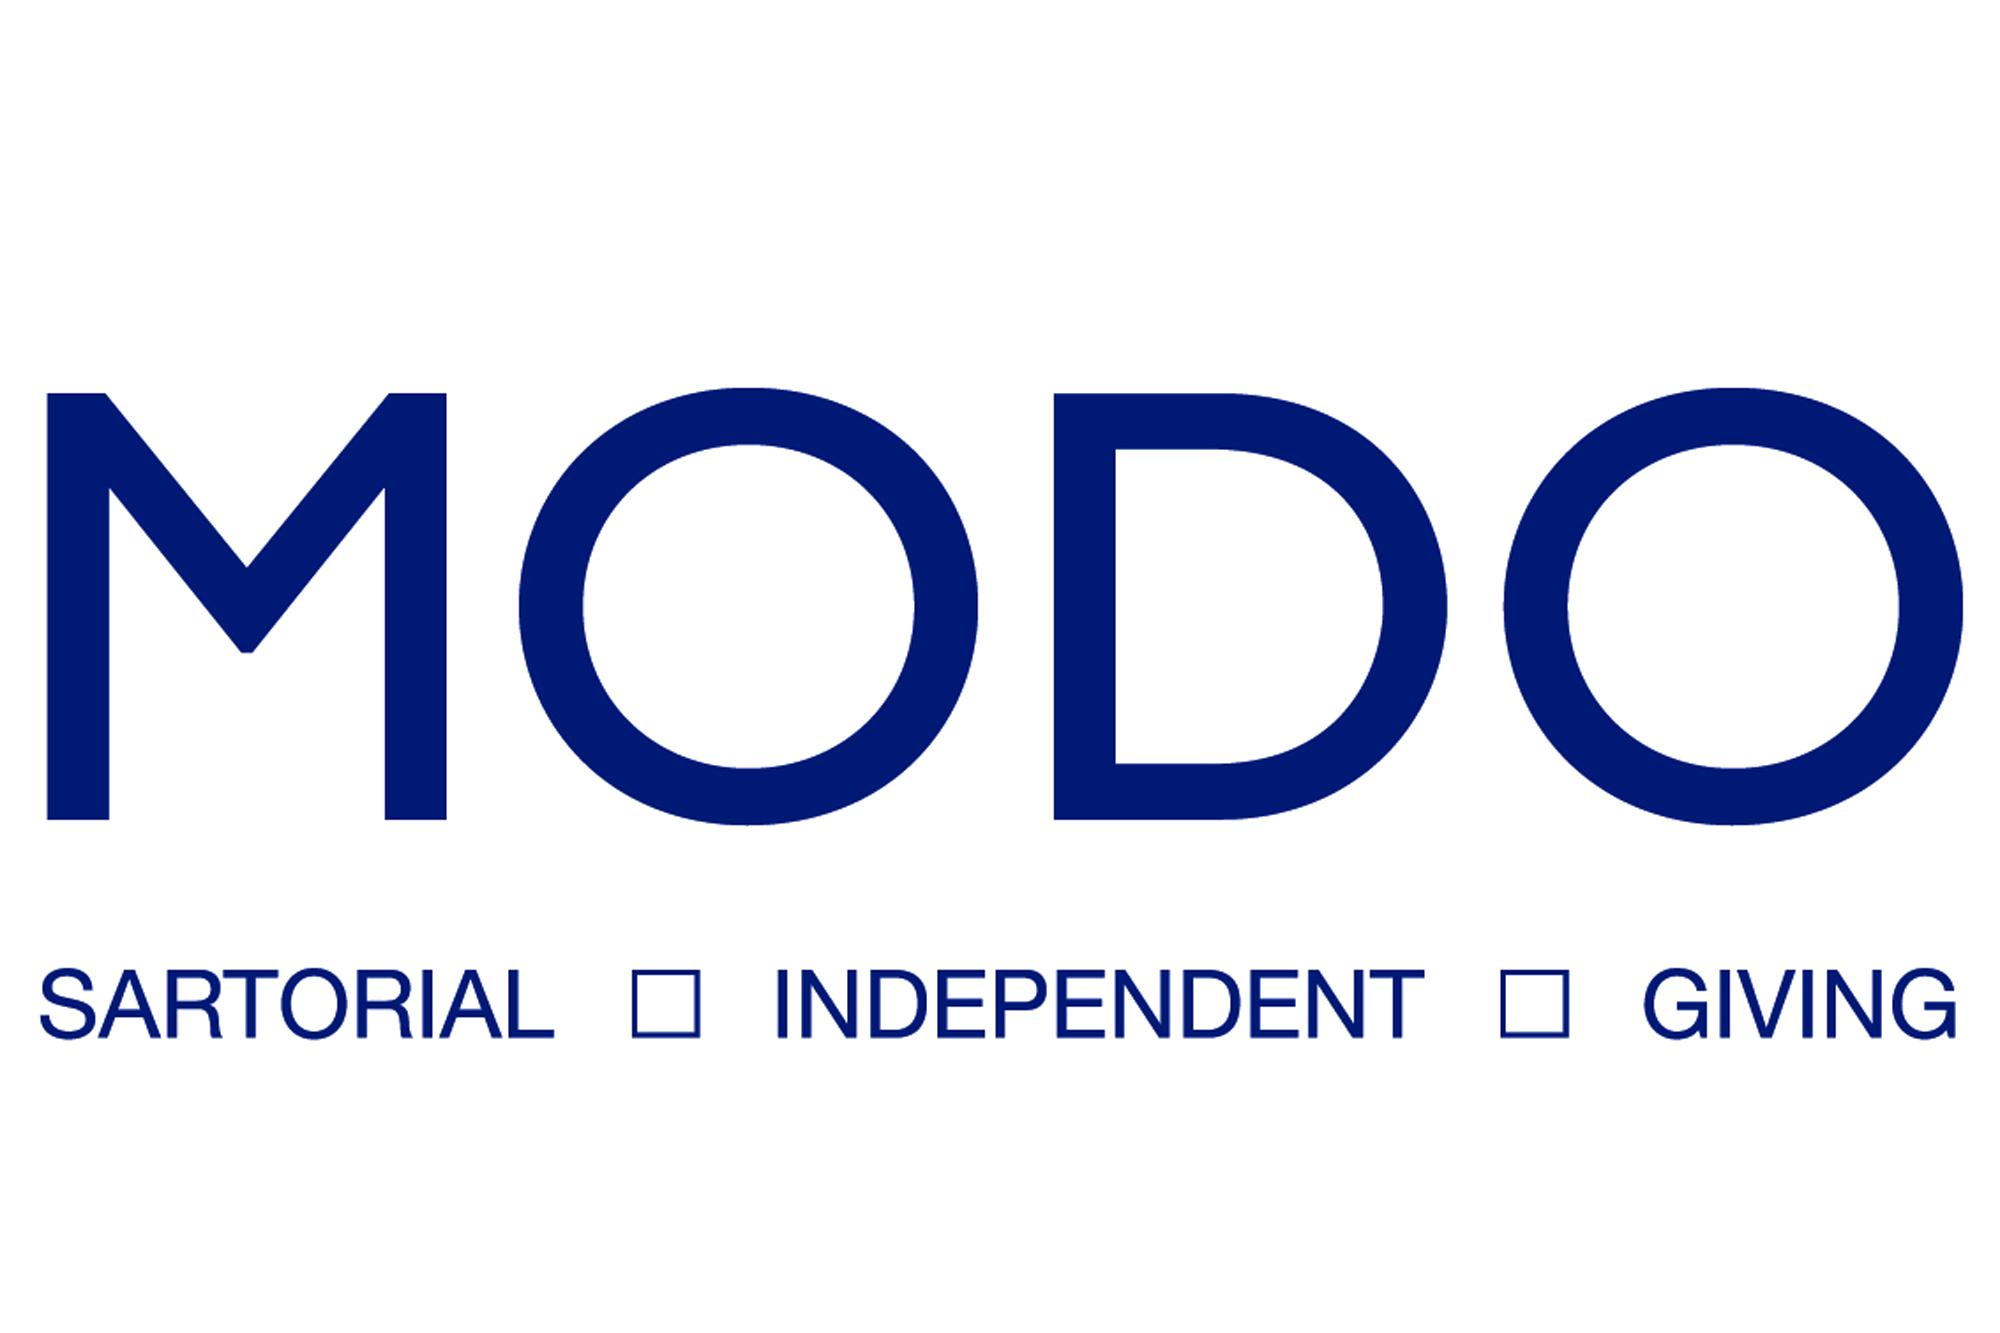 Modo - Modell 4099 PNK